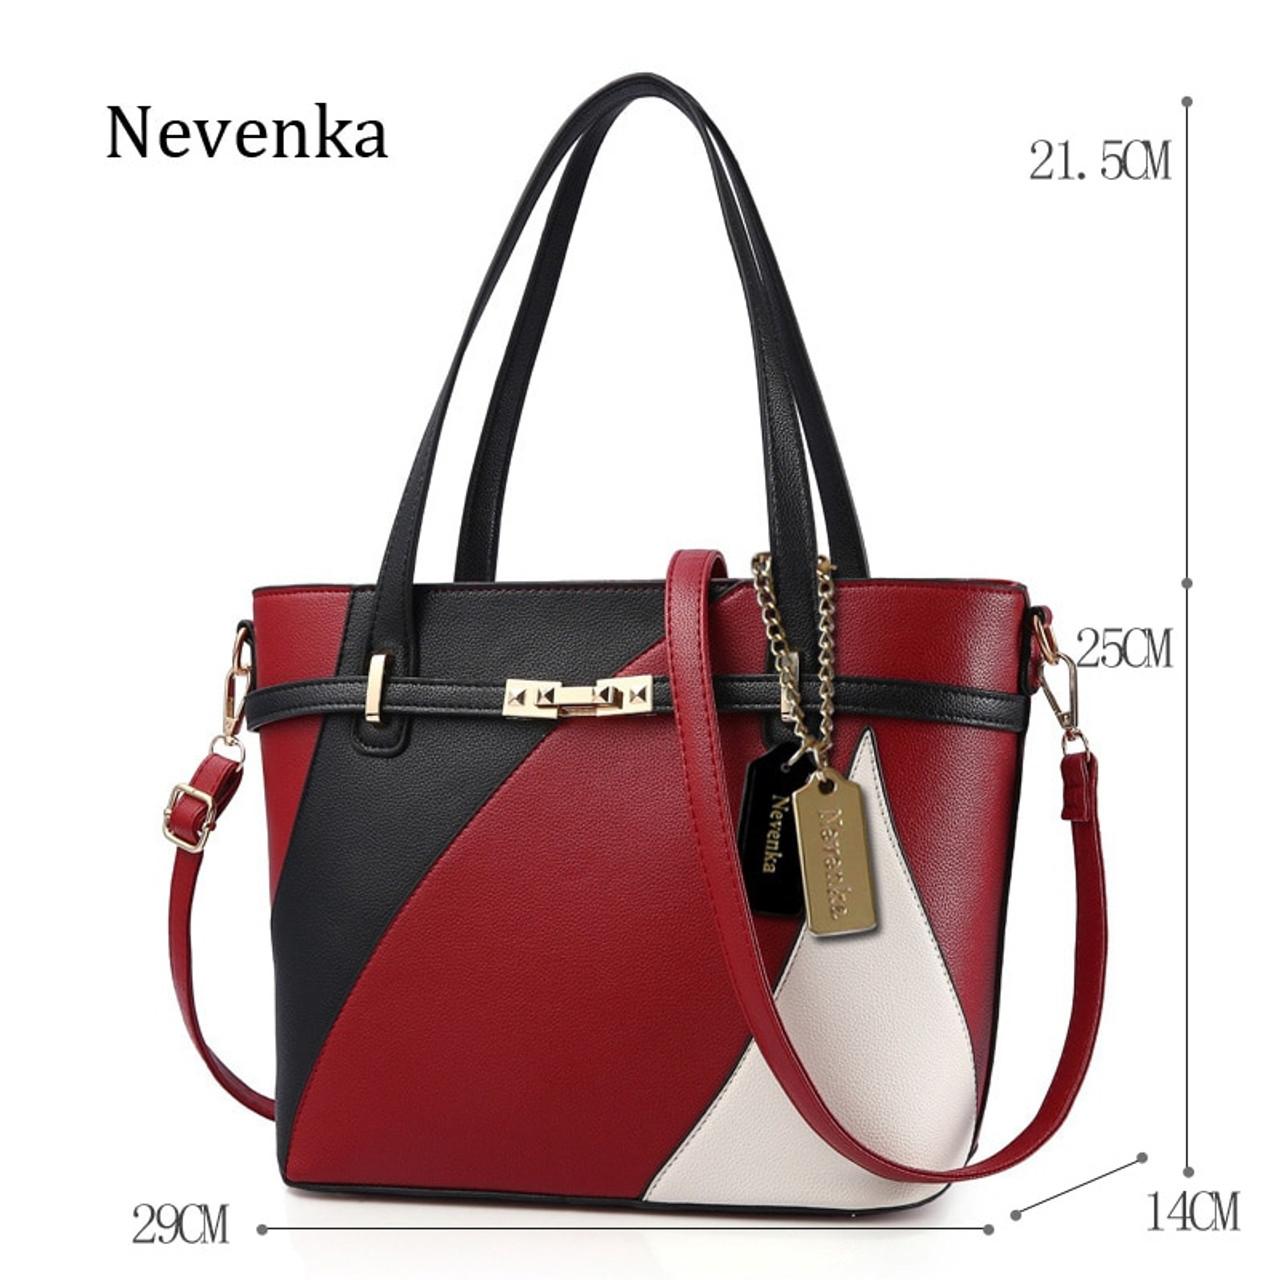 9a2e45cc6eebc ... Nevenka New Design Women Fashion Style Handbag Female Luxury Chains Bags  Sequined Zipper Messenger Bag Quality ...